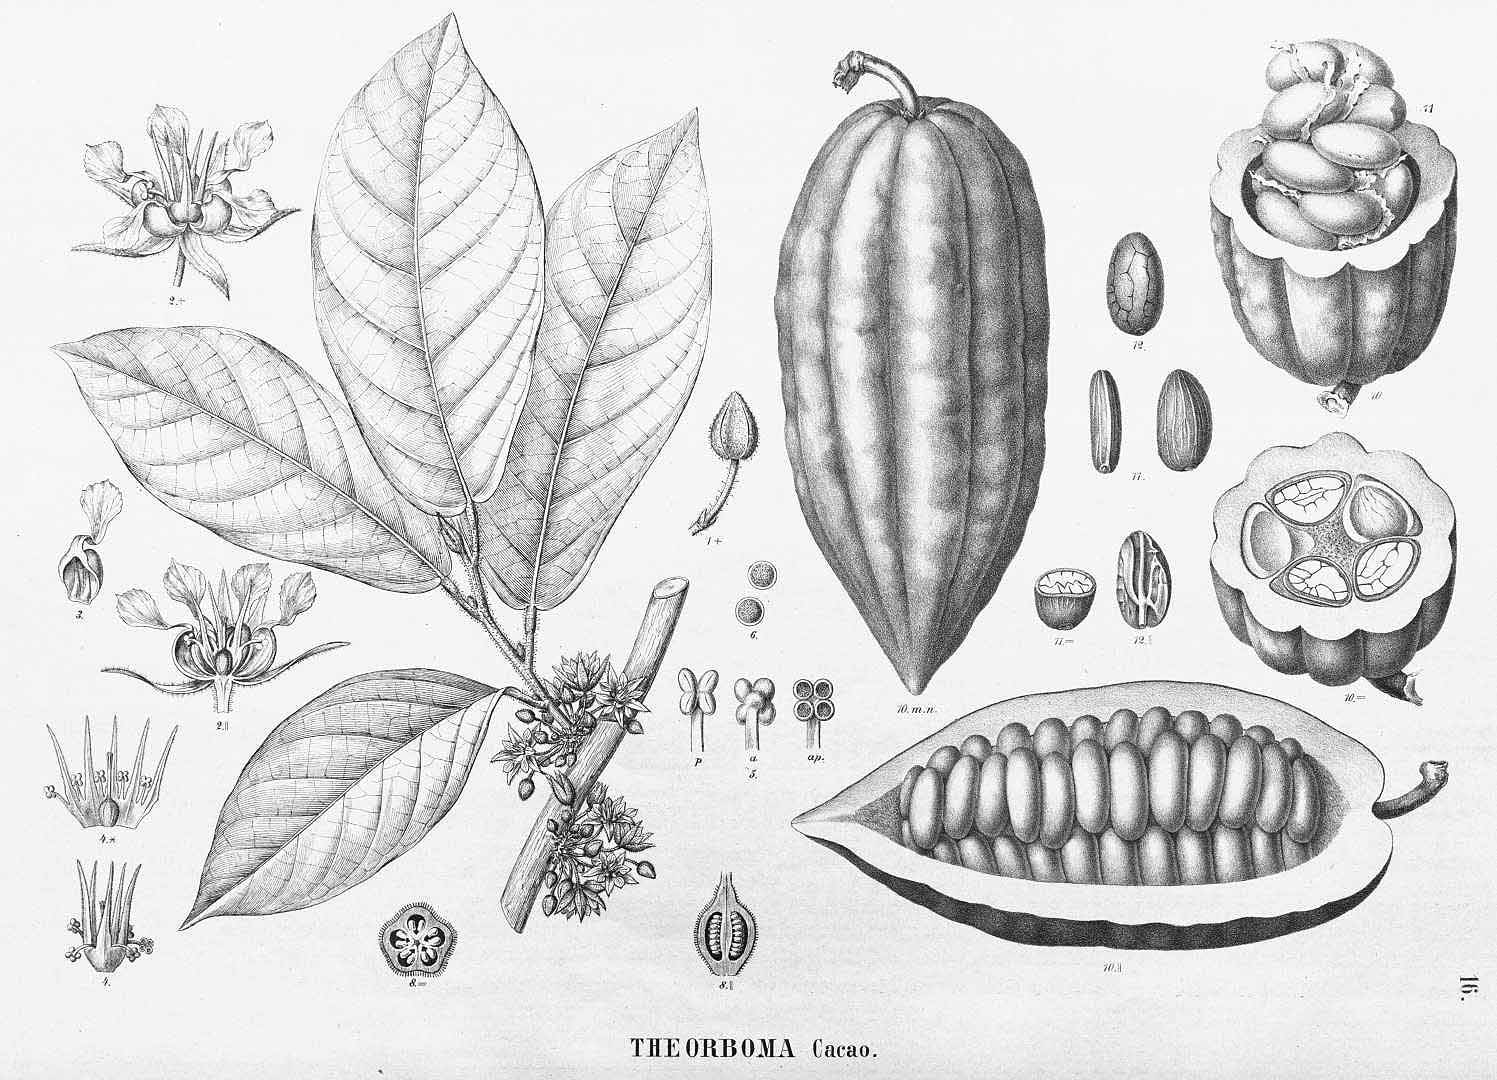 Theobroma lithograph.jpg